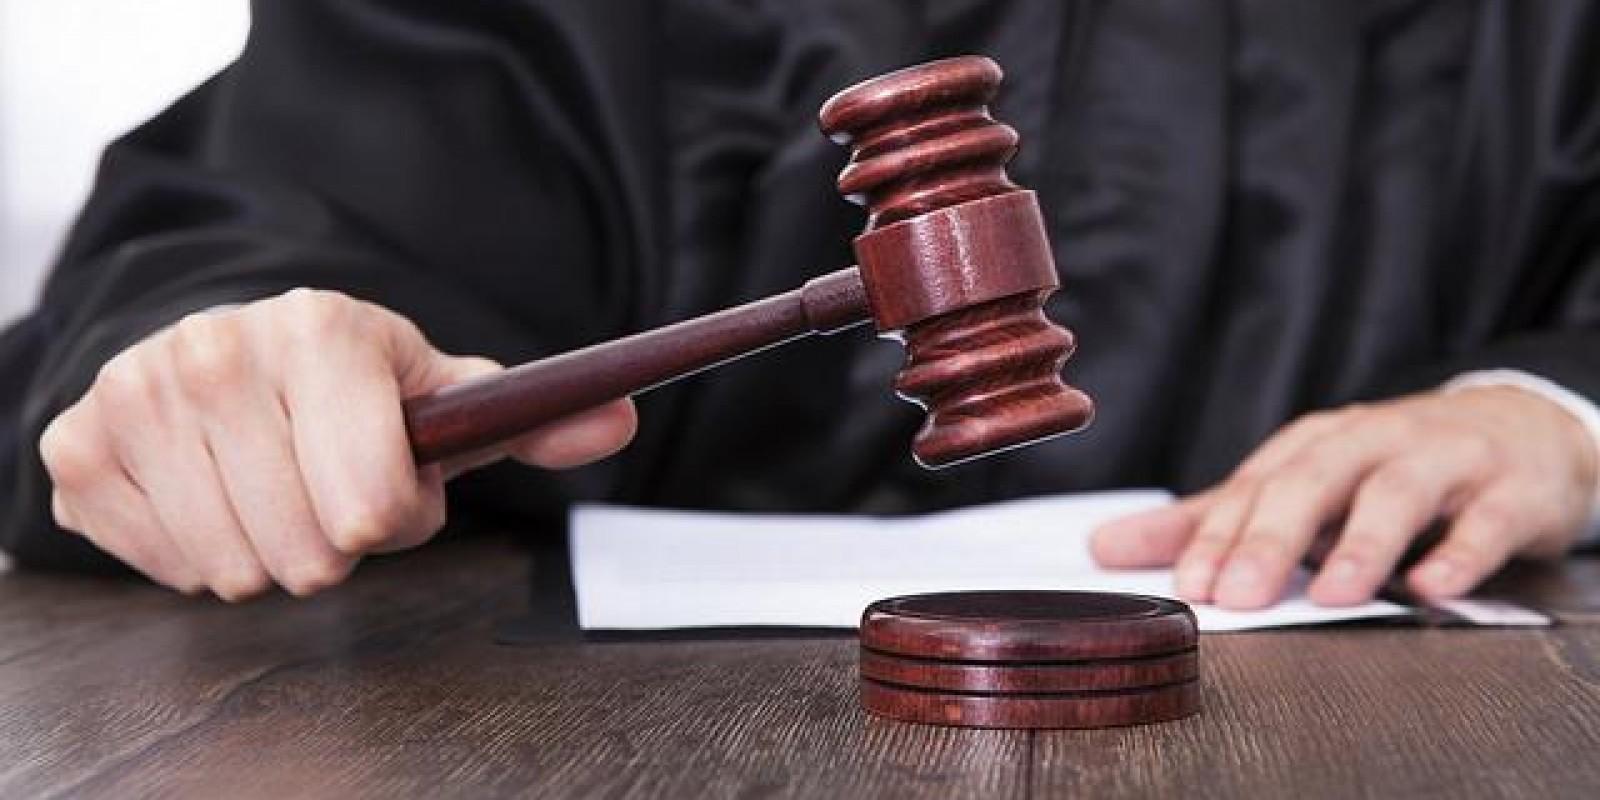 Sindicato recupera R$ 134,4 milhões para bancários